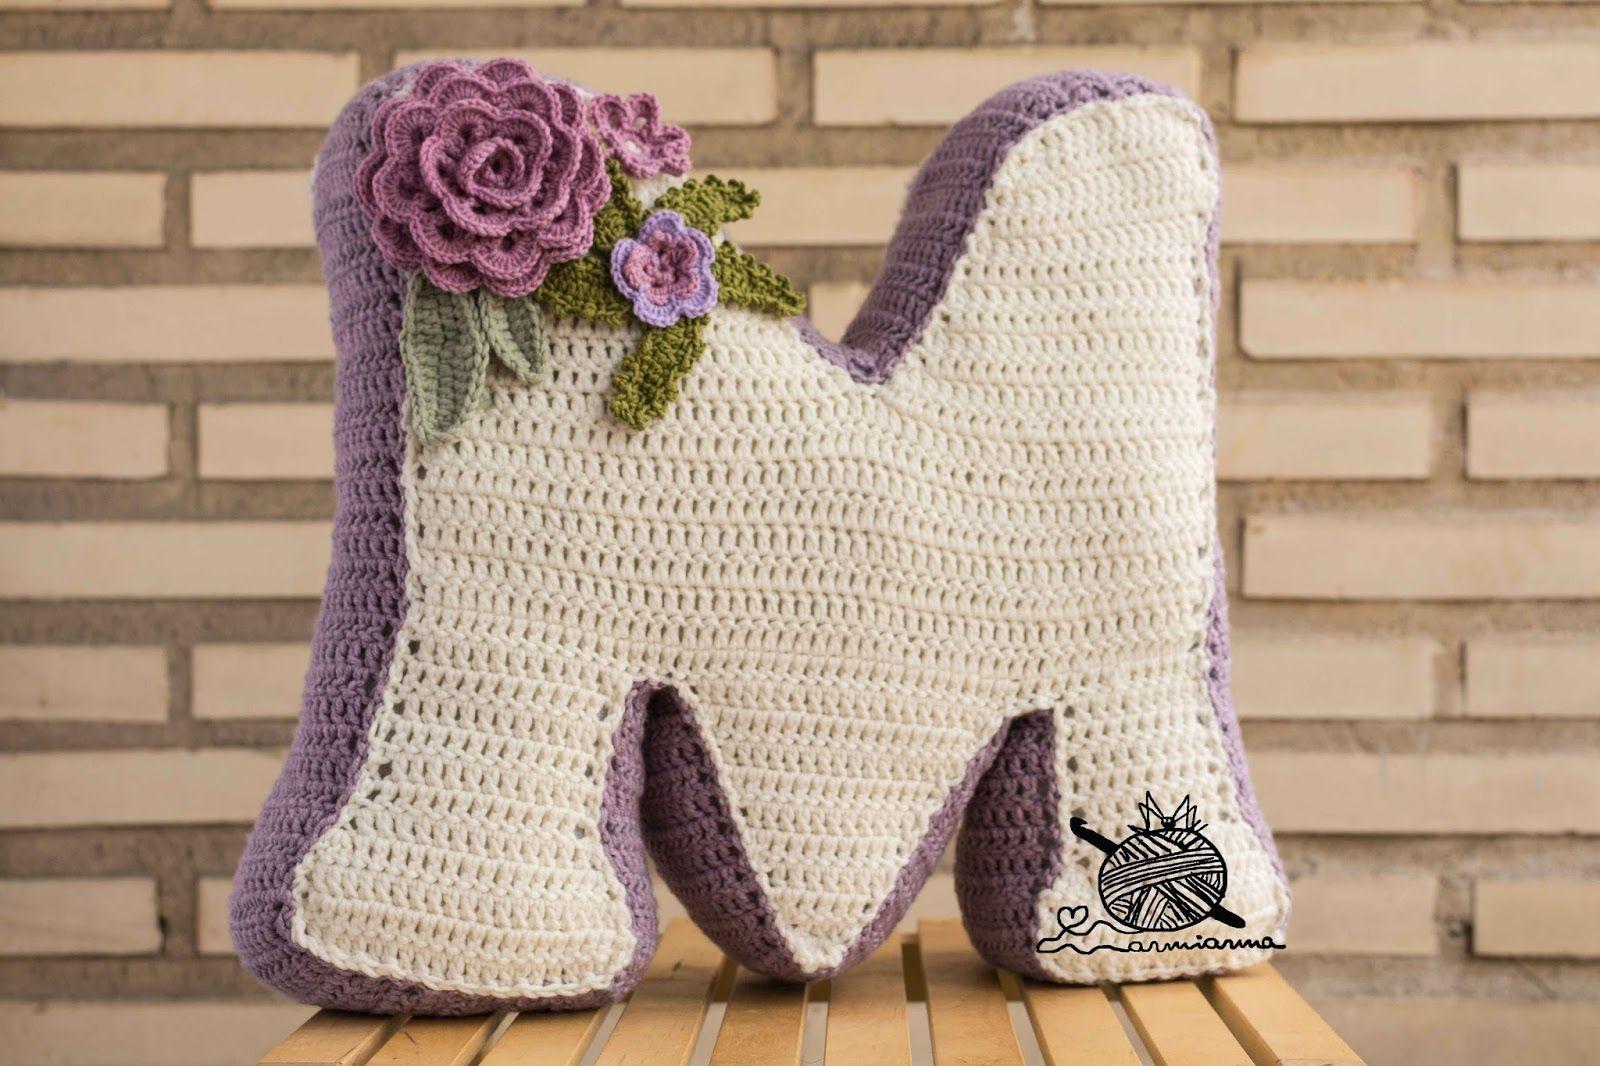 Letras ganchillo patron | Crochet | Pinterest | Ganchillo patrones ...